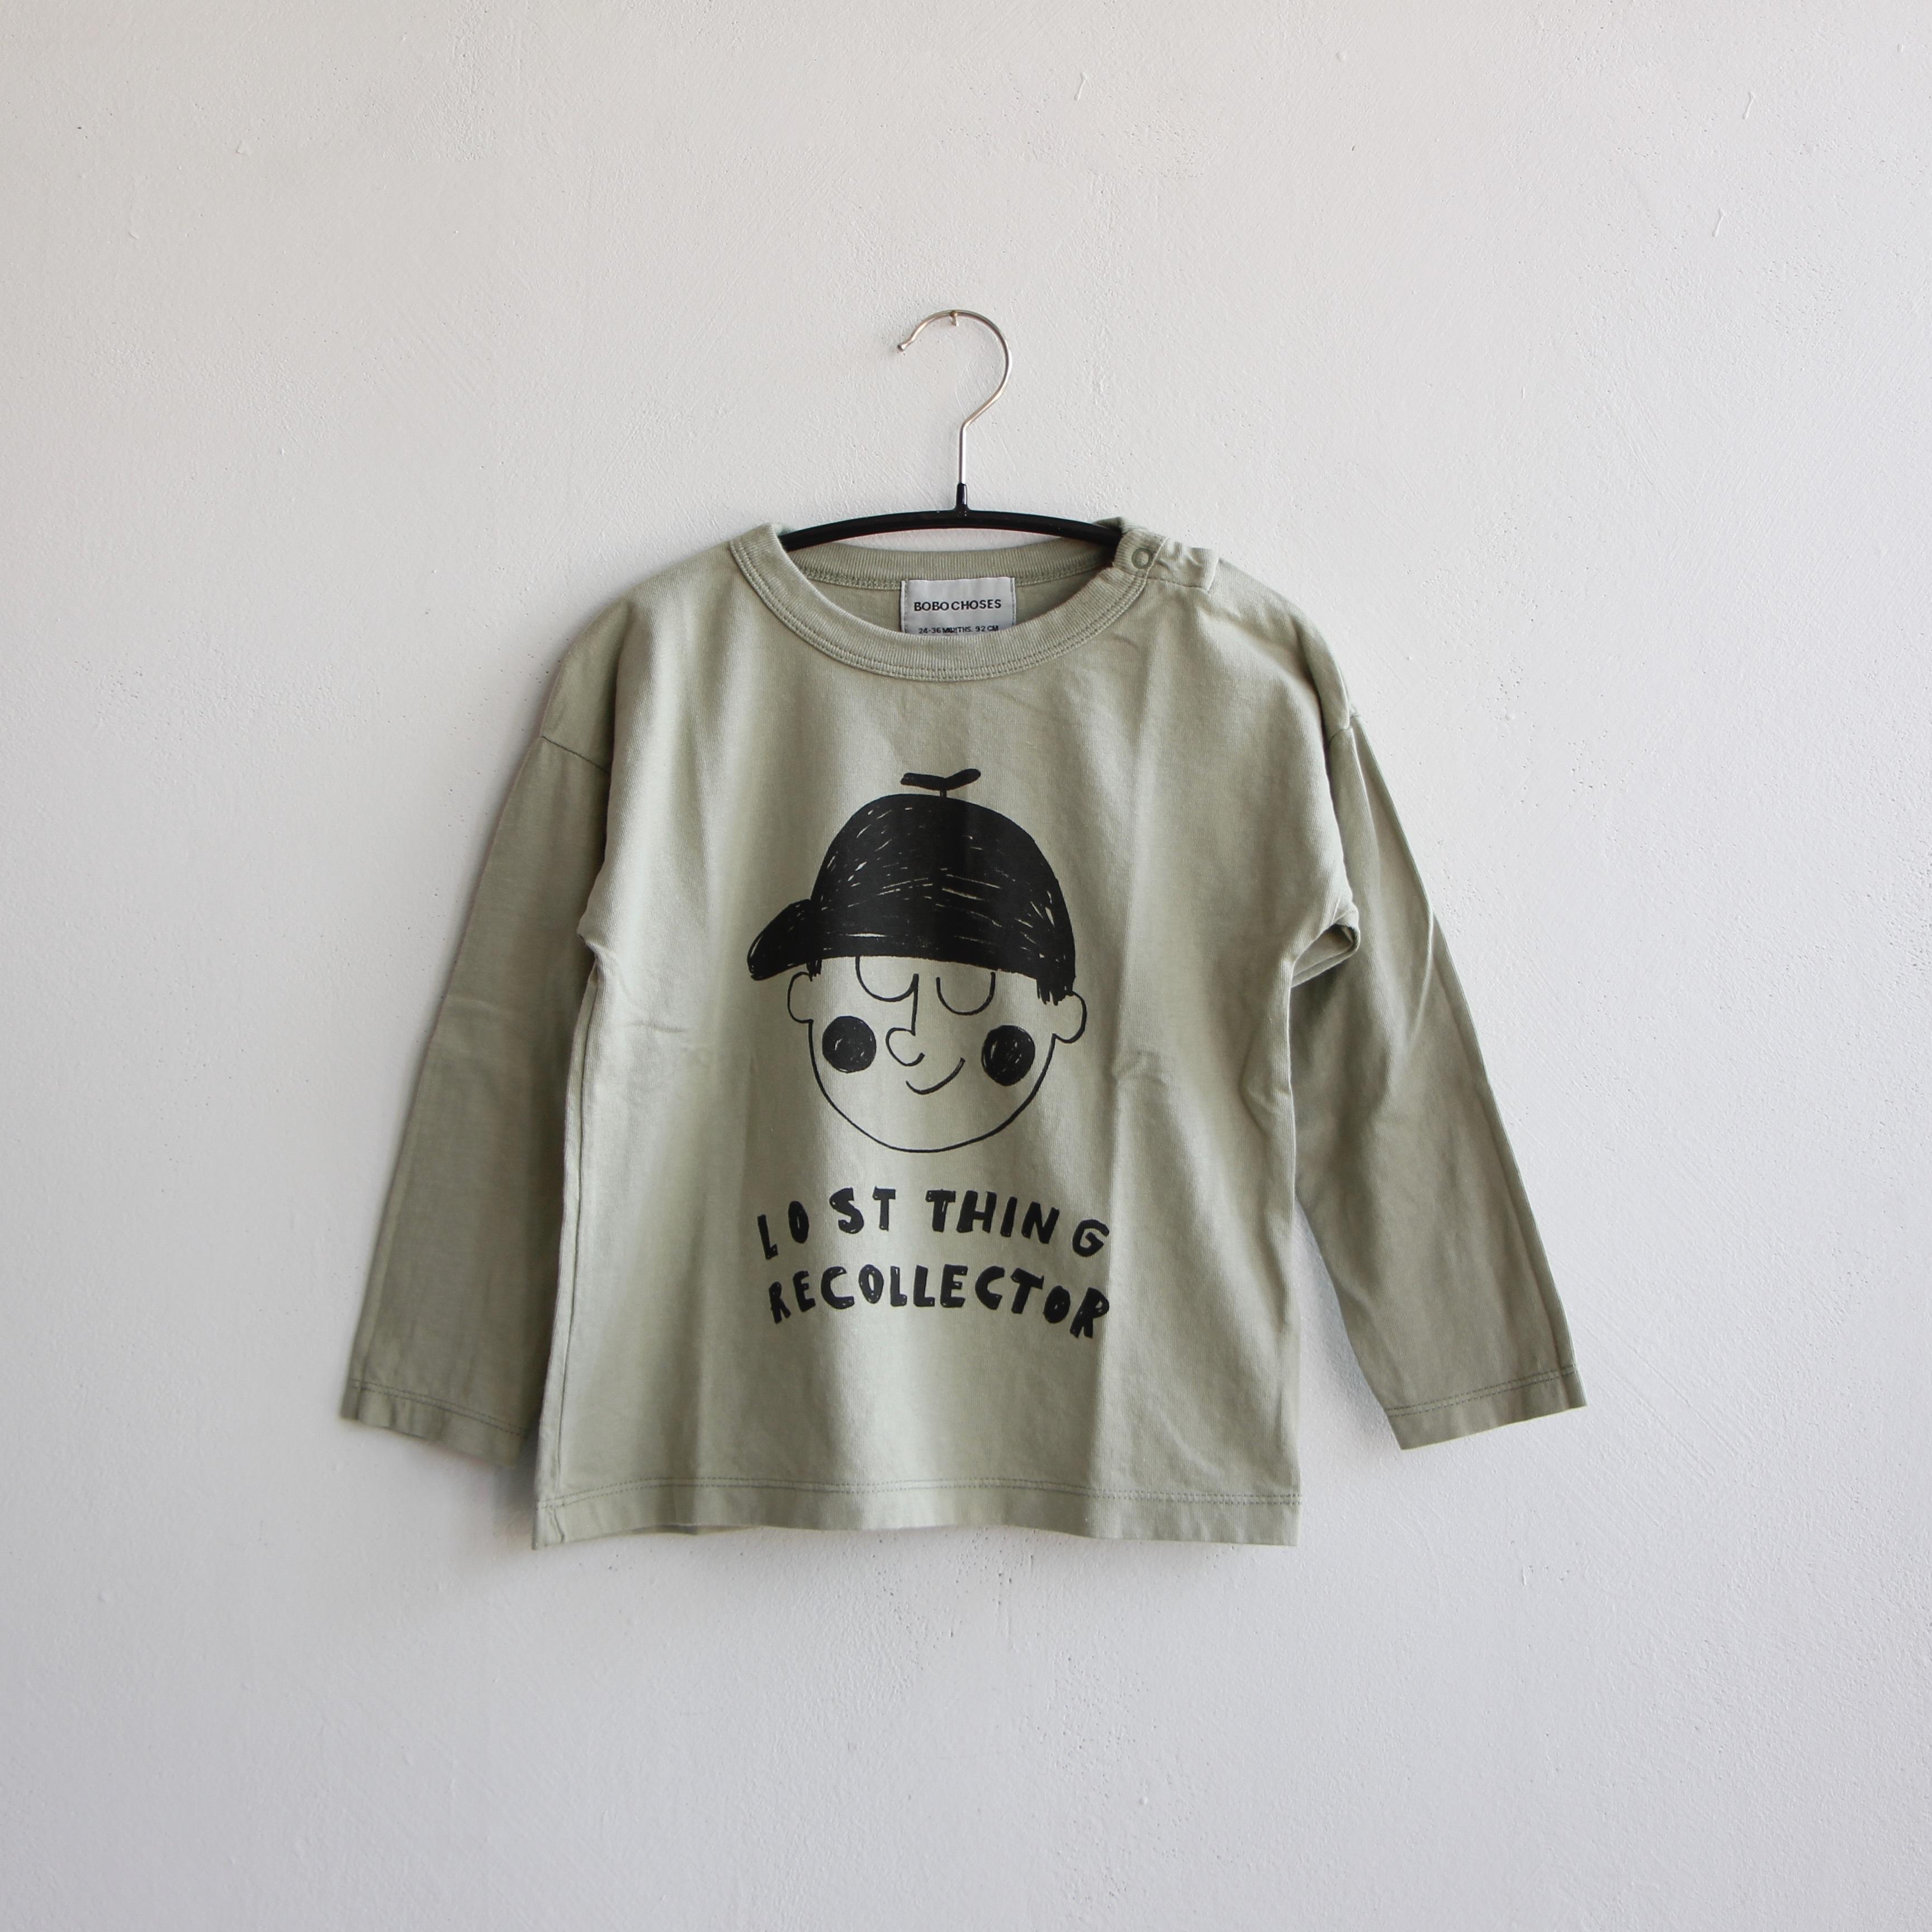 《BOBO CHOSES 2020AW》Boy long sleeve T-shirt / 6-36M